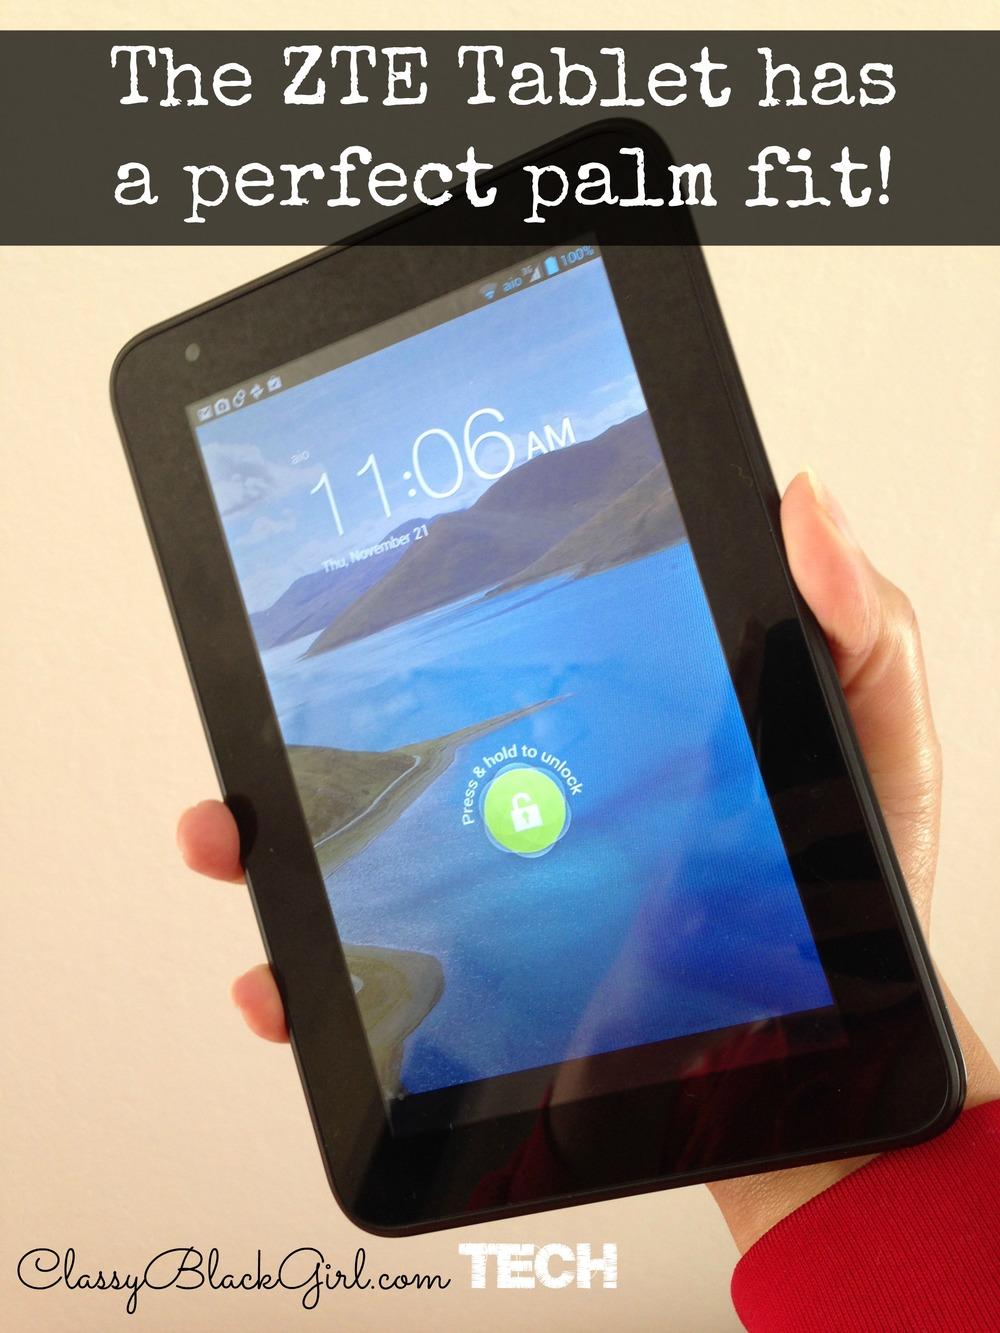 My Zippy ZTE Tablet Experience! | Tech � ClassyBlackGirl.com